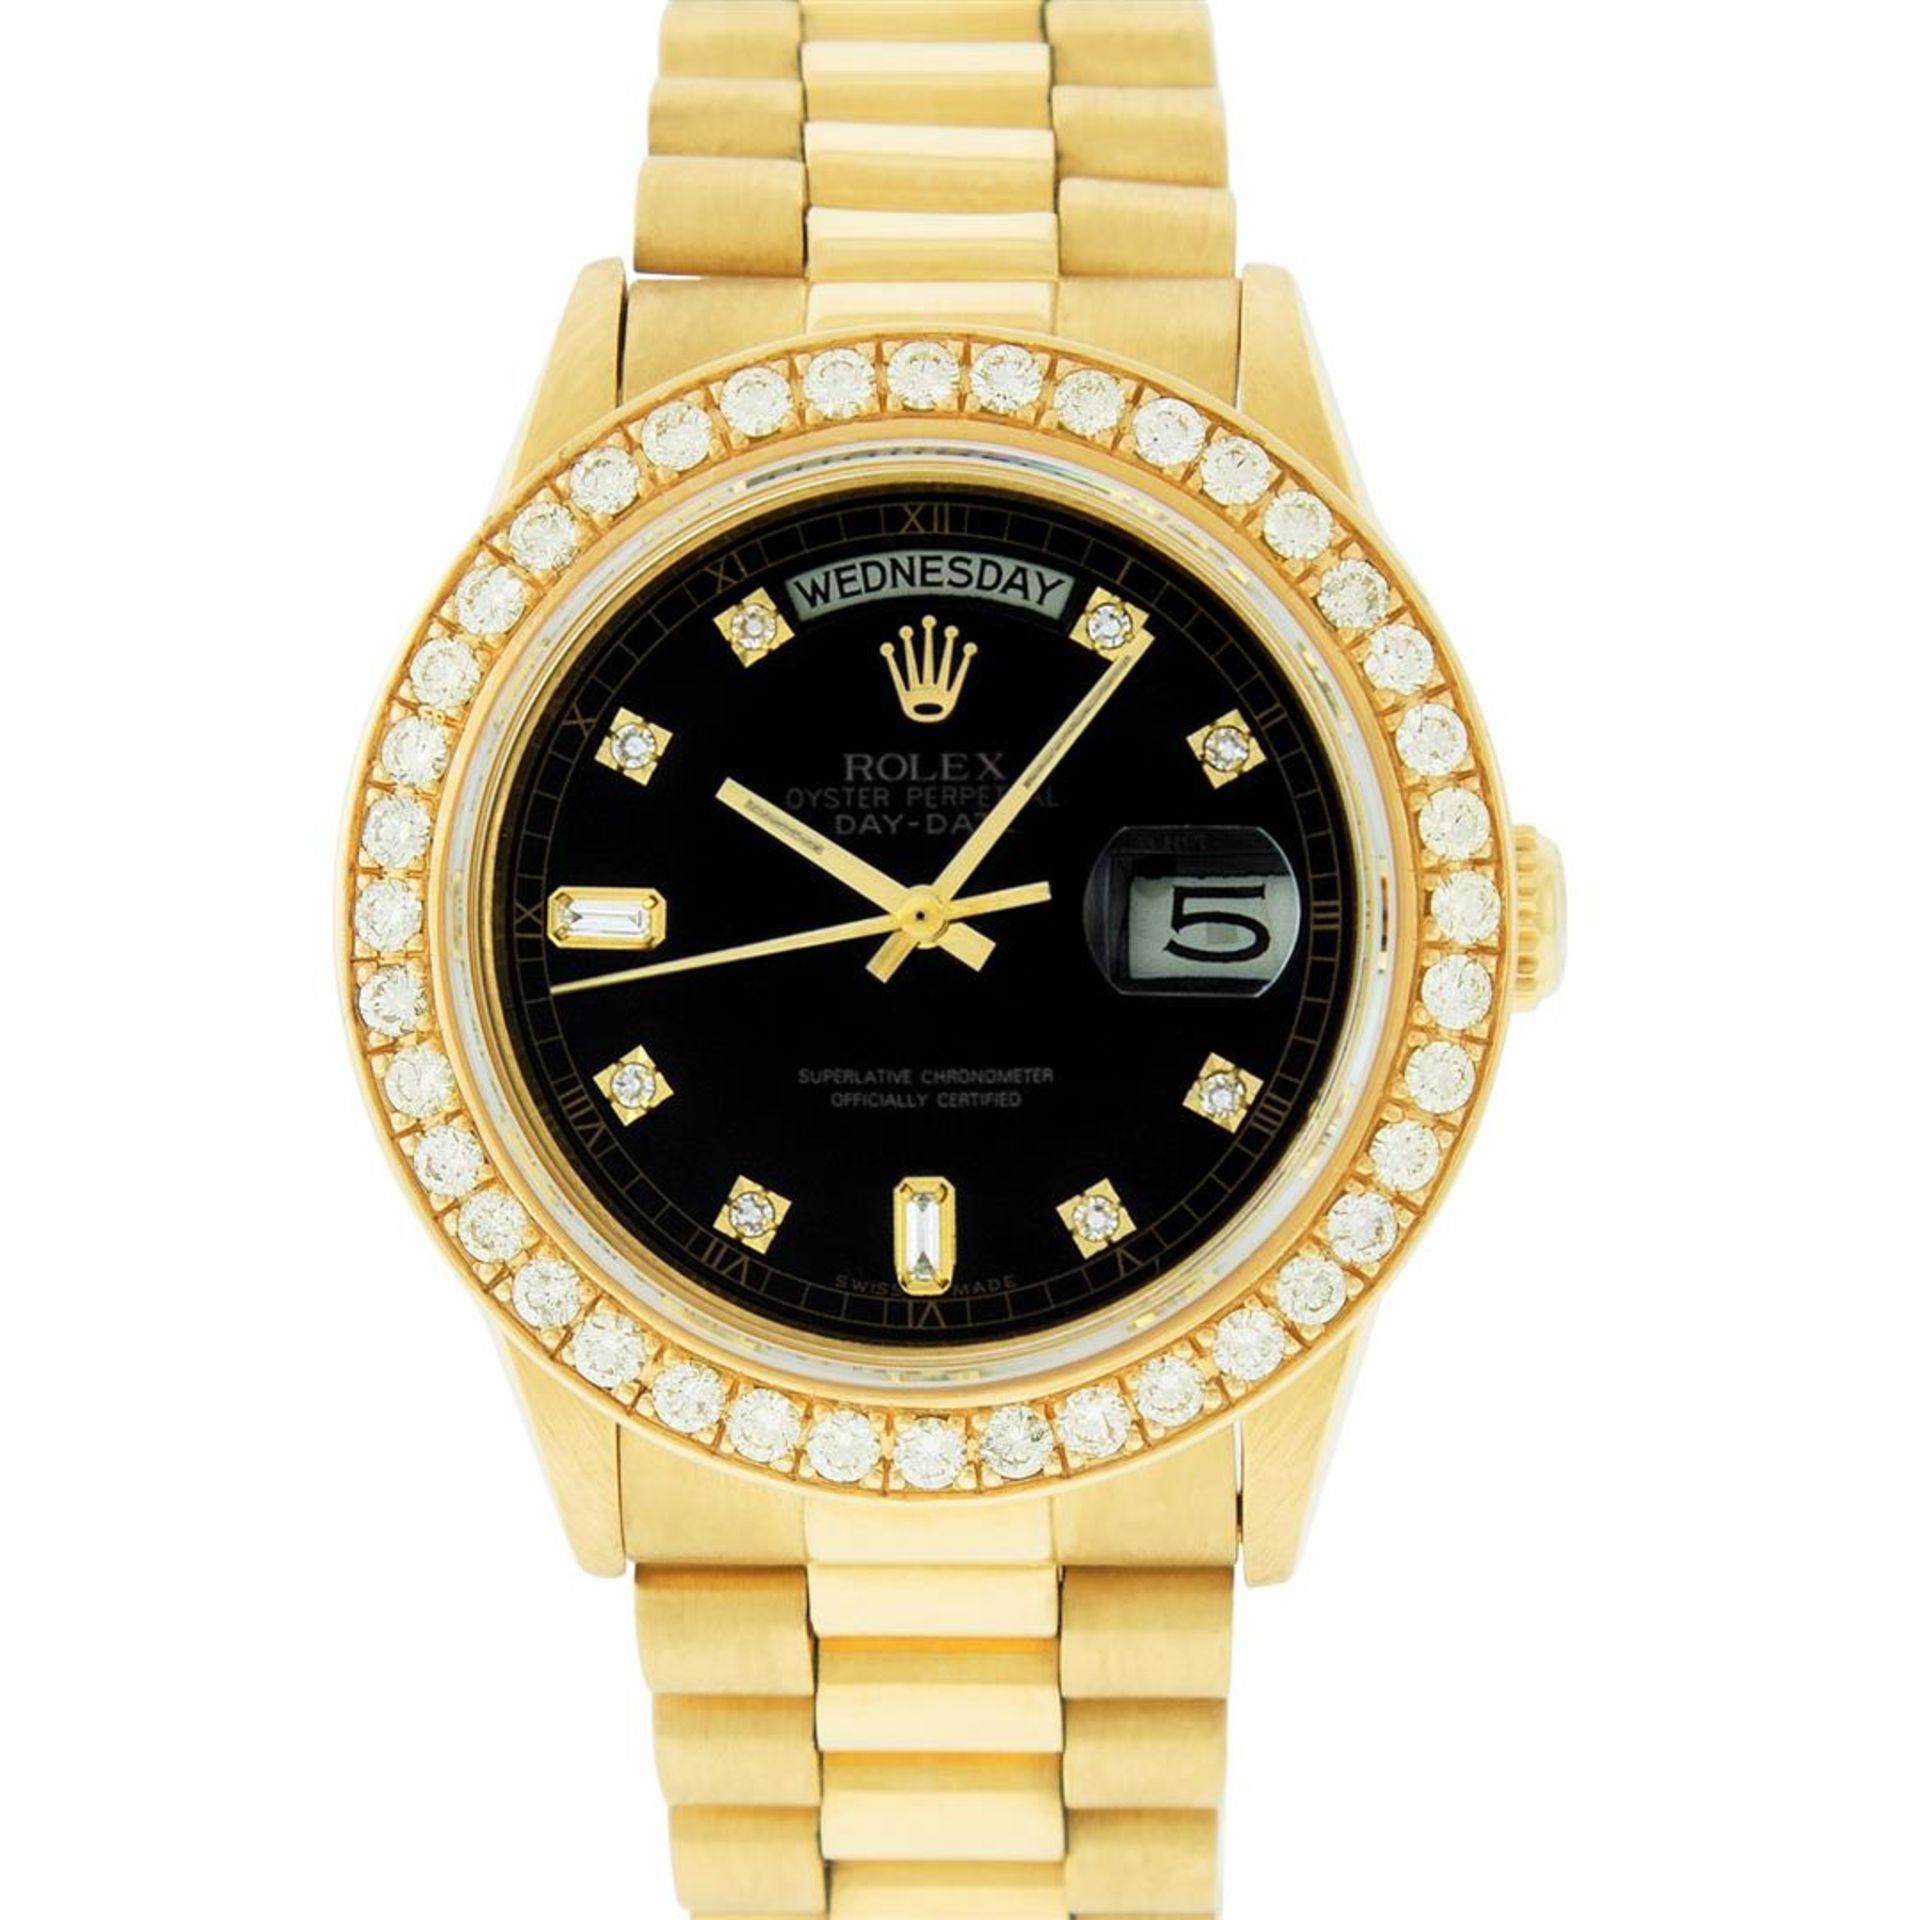 Rolex Mens 18K Yellow Gold Black Diamond 2.5 ctw Quickset President Wristwatch W - Image 2 of 6